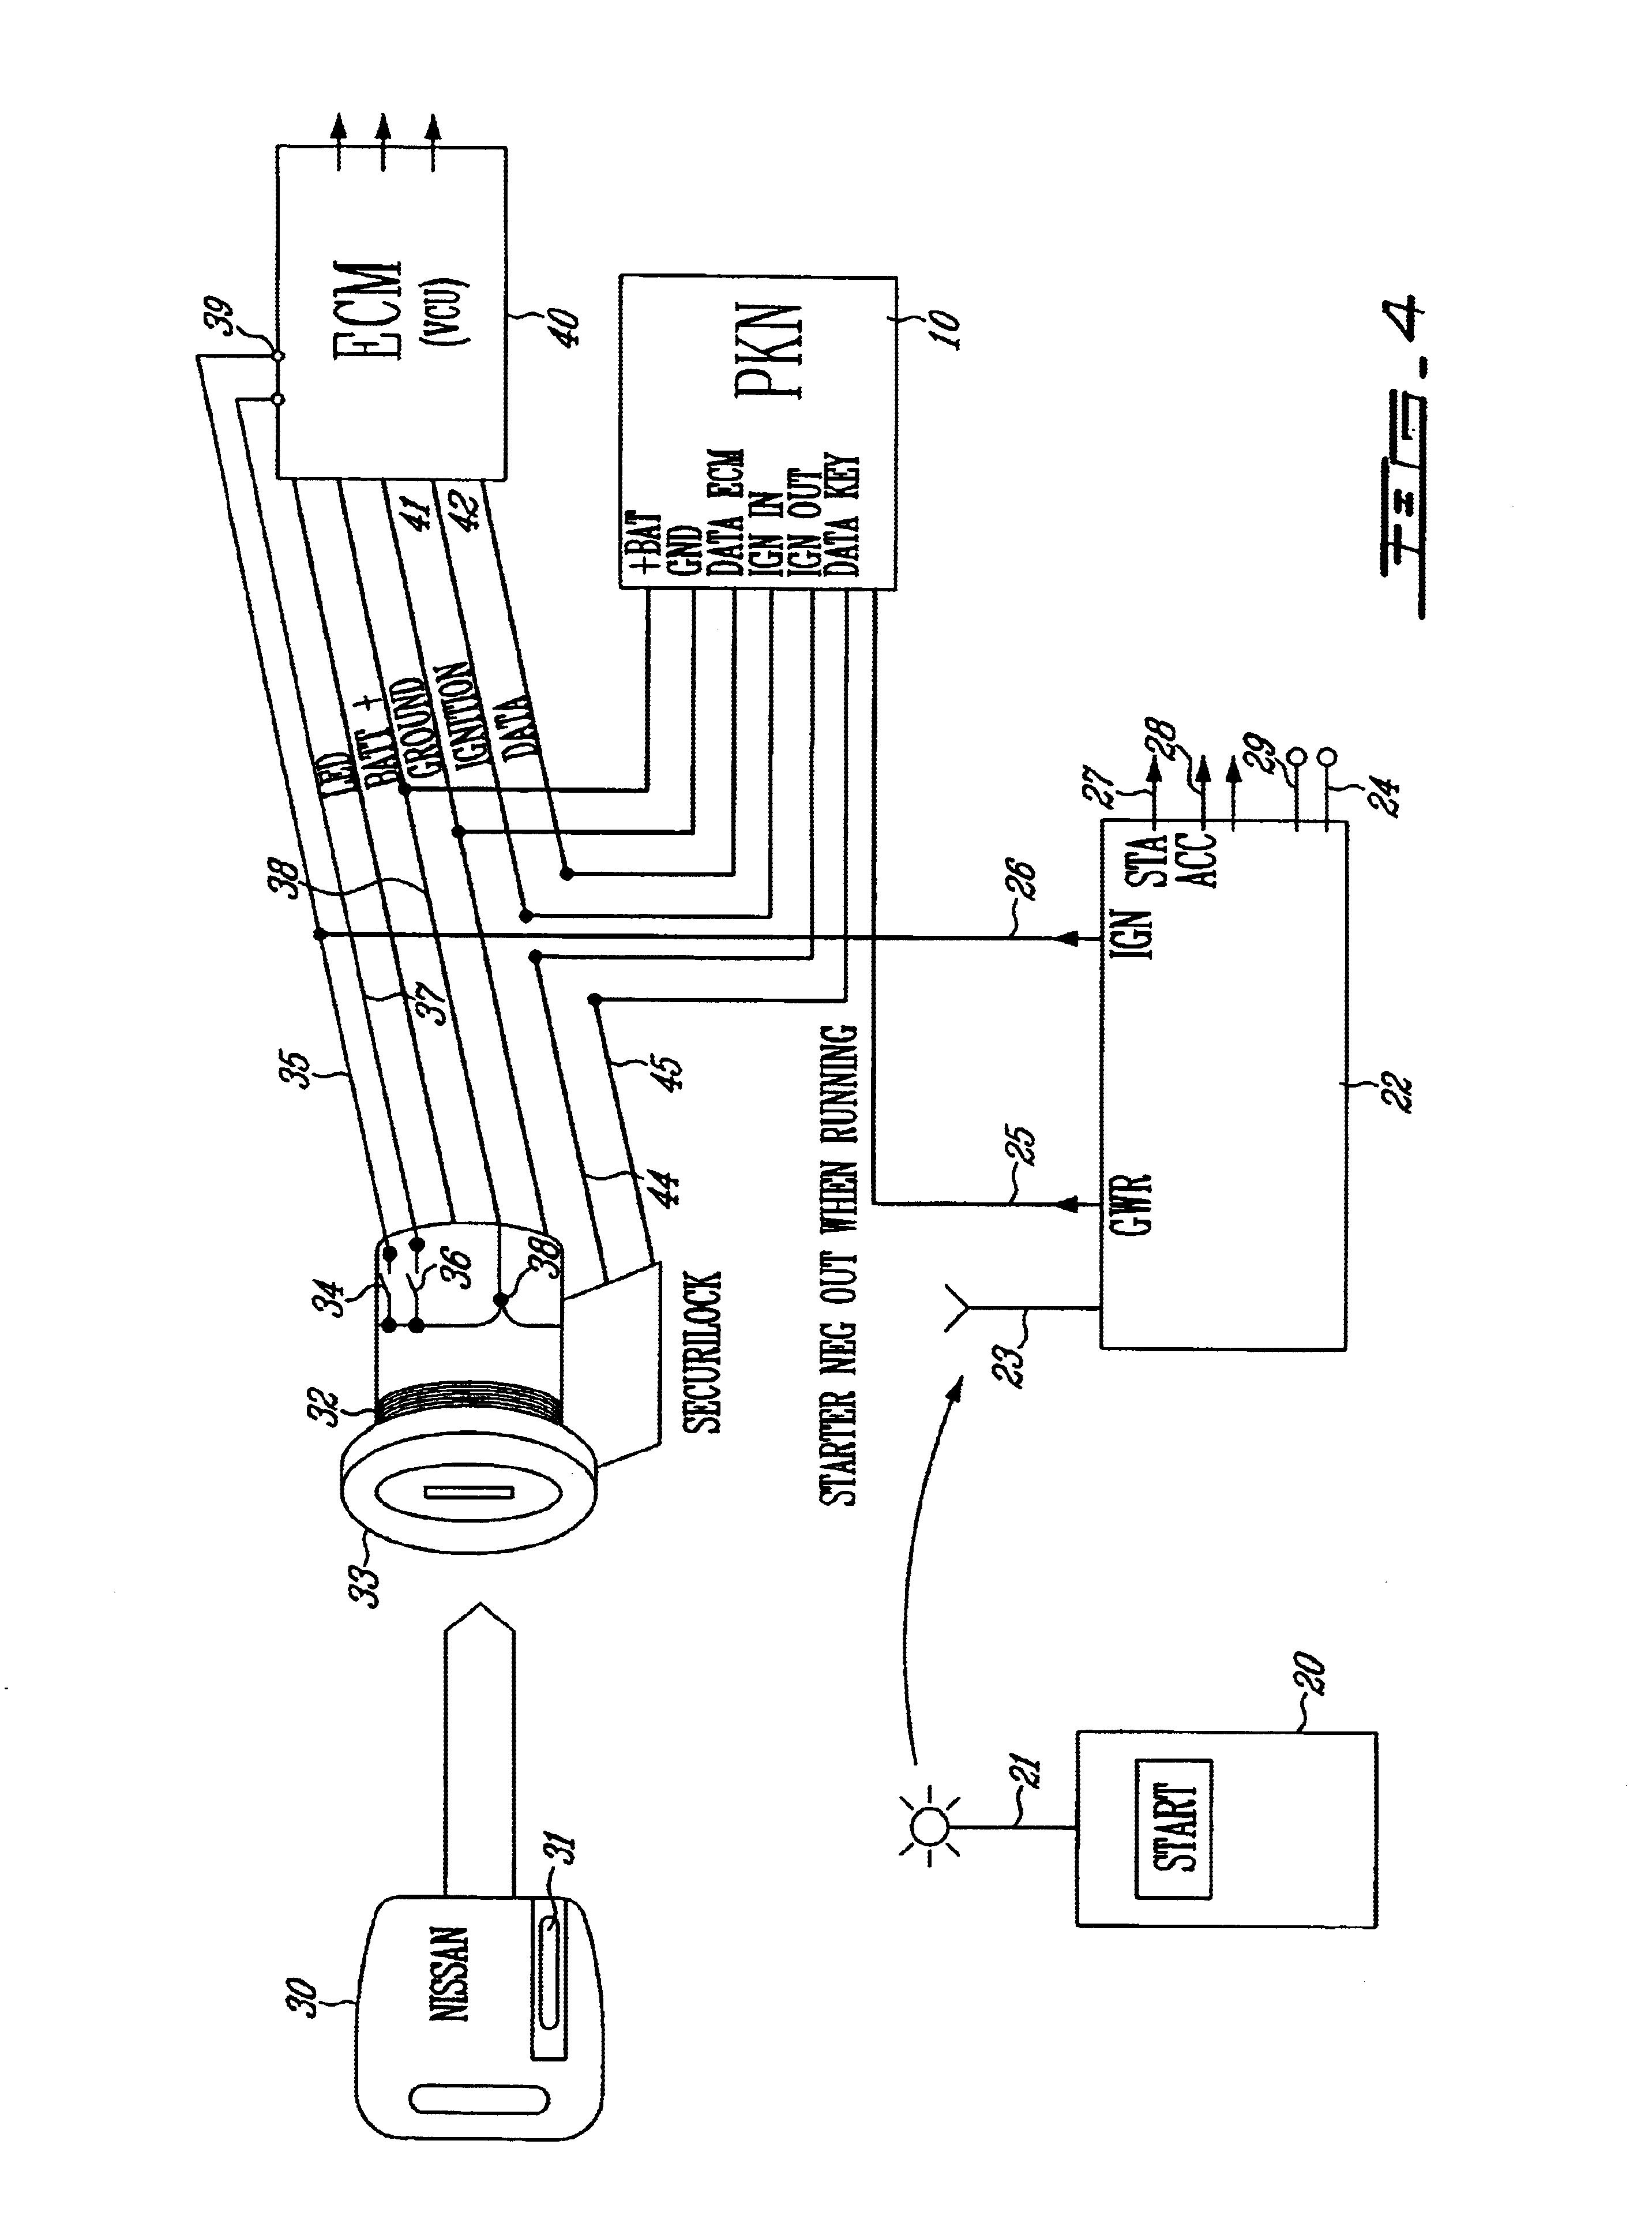 Patent Drawing  sc 1 st  Google : passkey 3 wiring diagram - yogabreezes.com